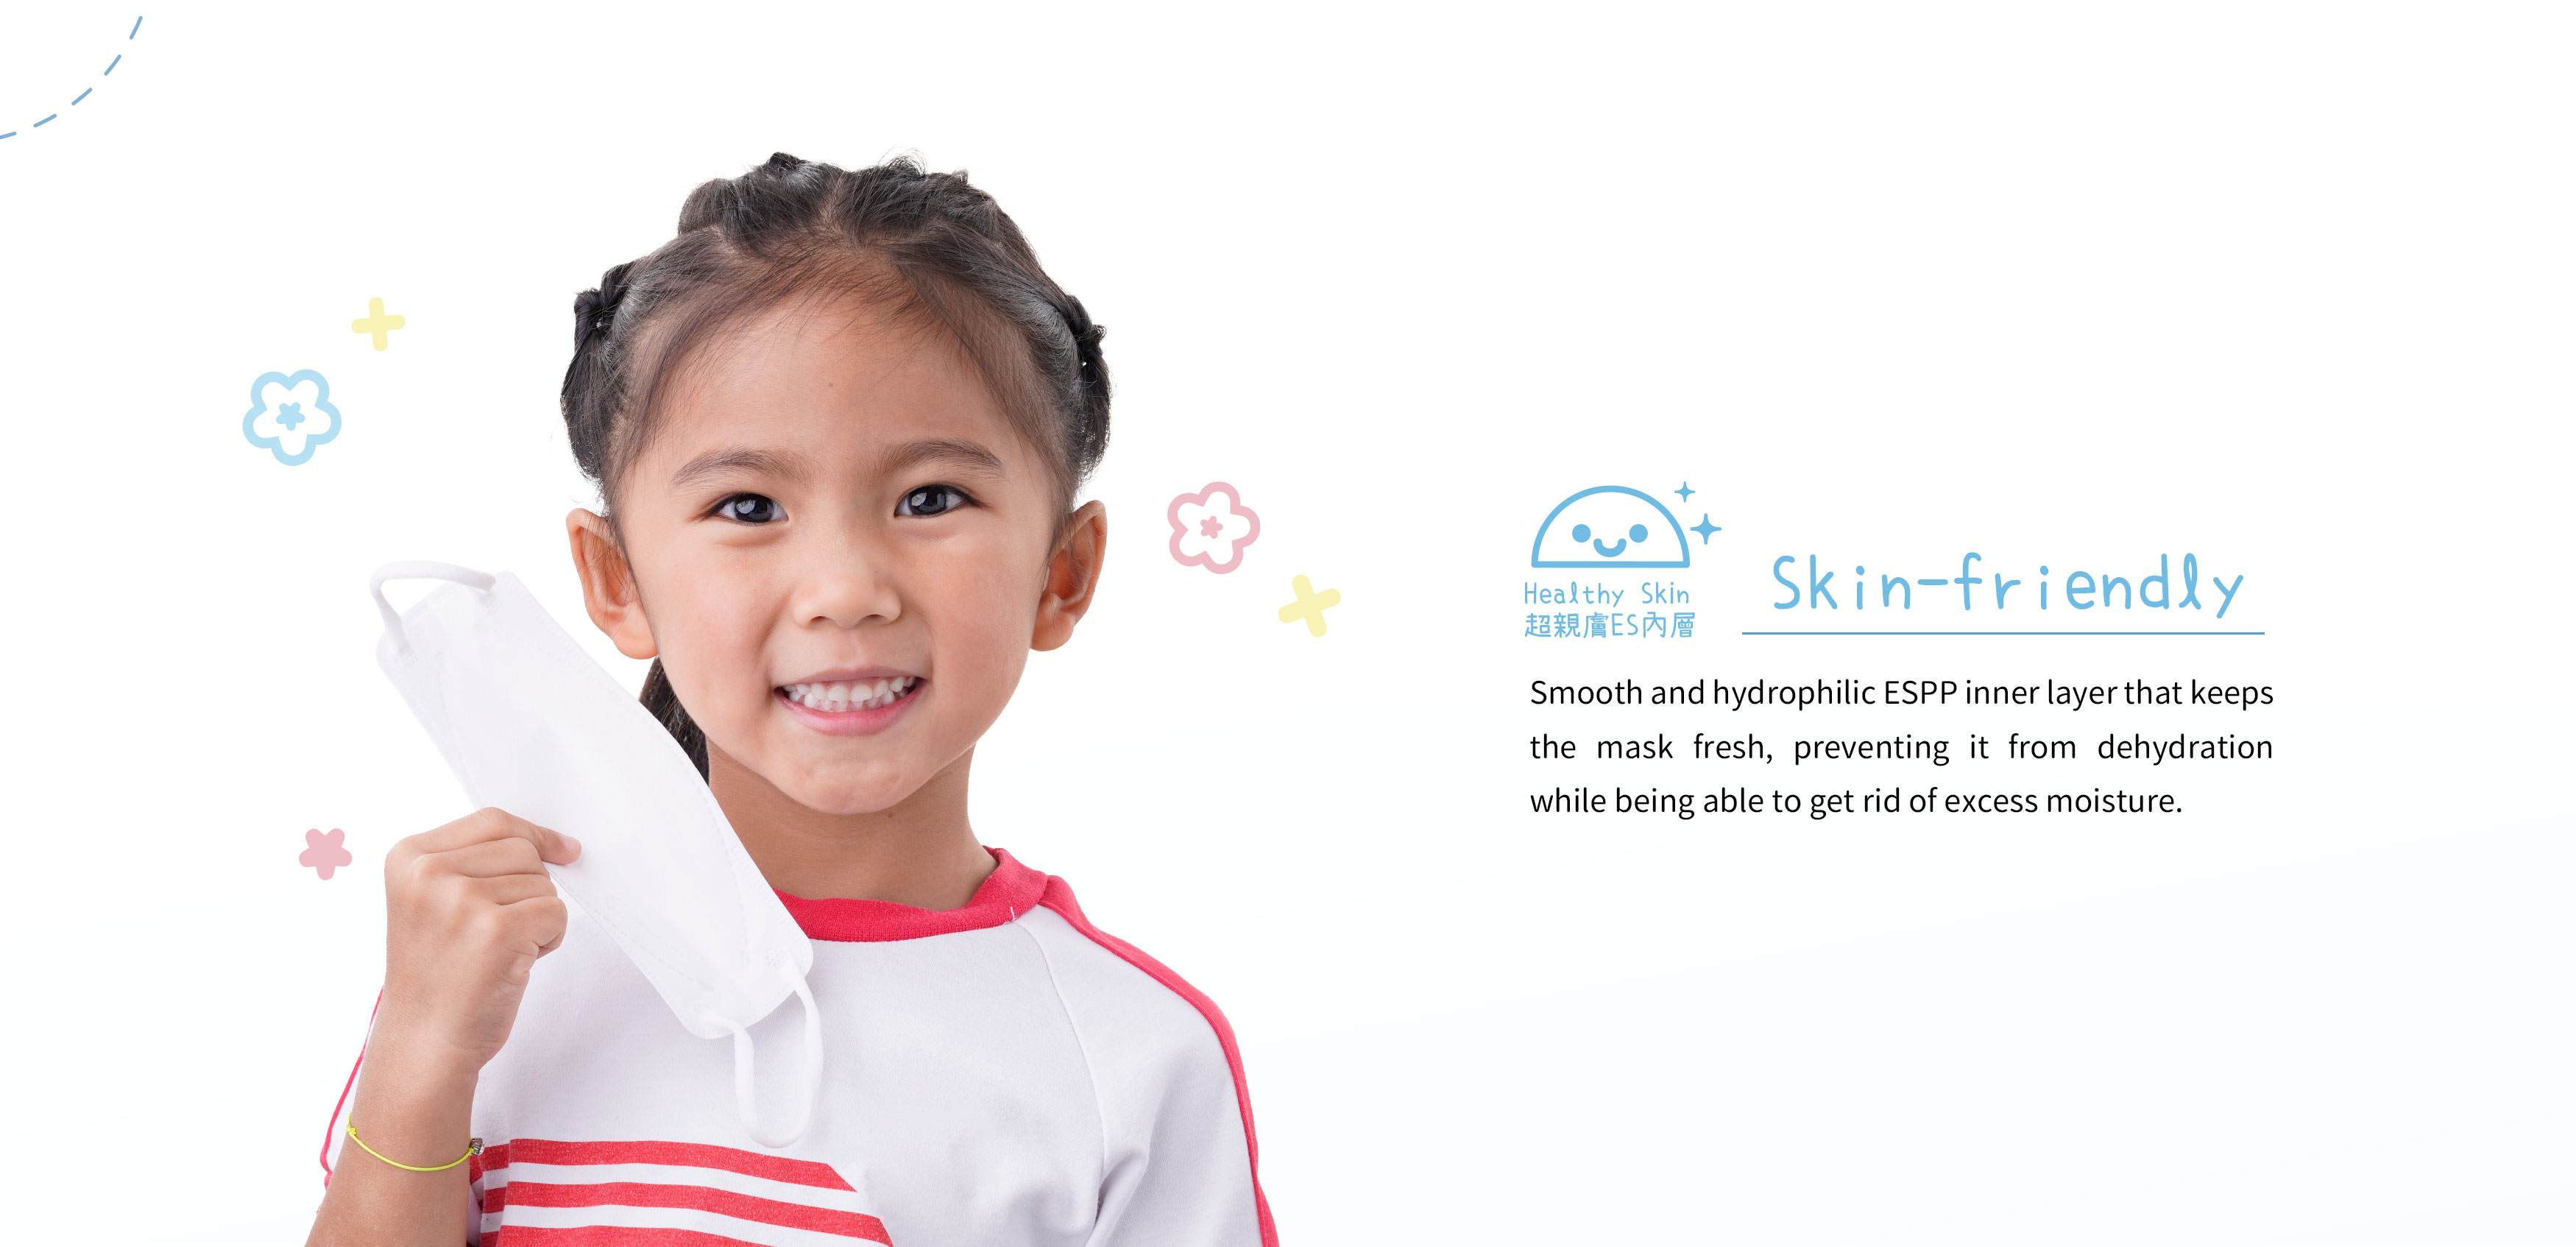 mask-sav-kids-7.jpg